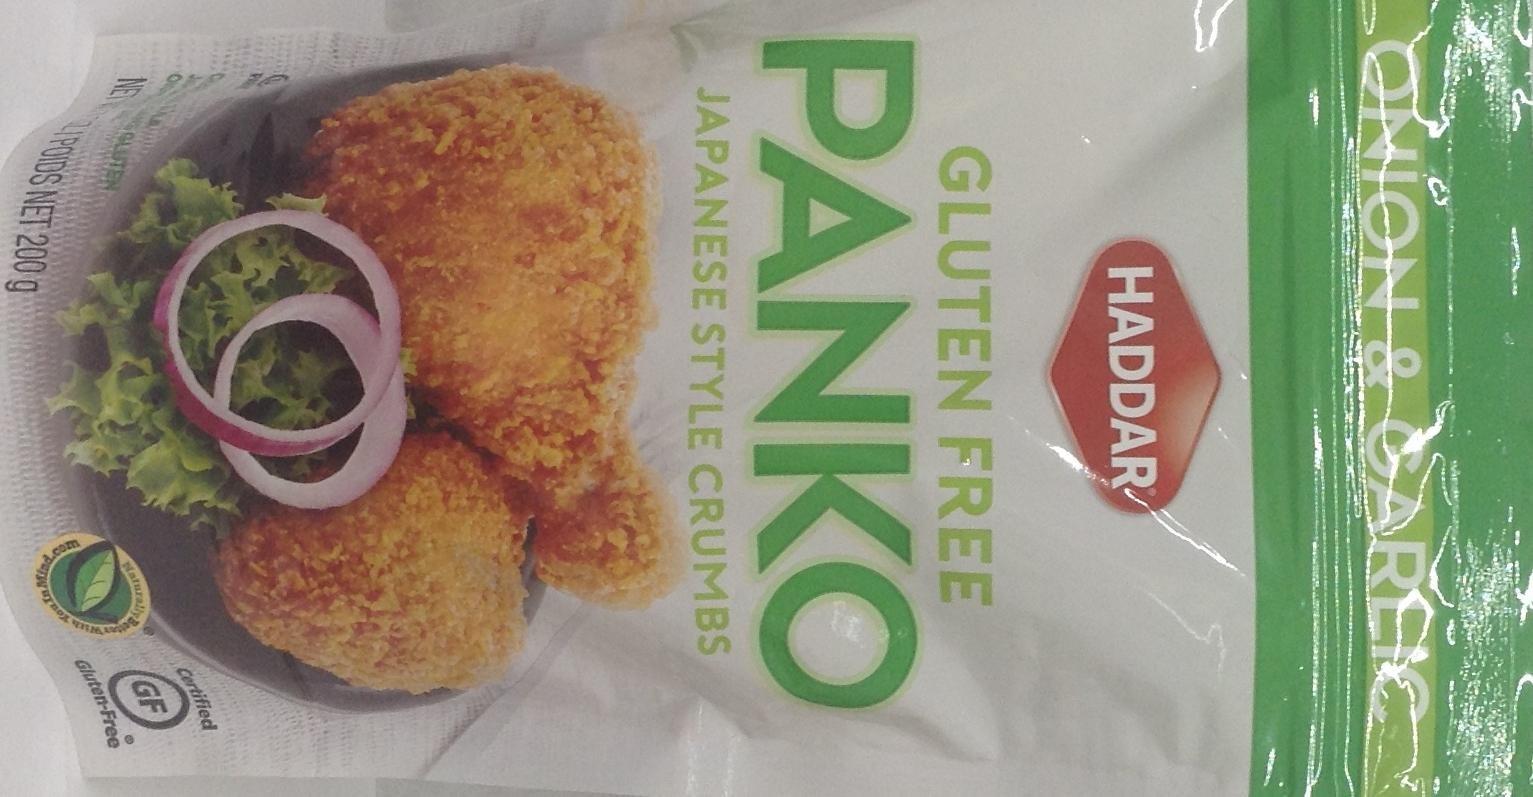 Haddar Panko Onion & Garlic Japanese Style Crumbs Kosher For Passover 7 Oz. Pk Of 1.